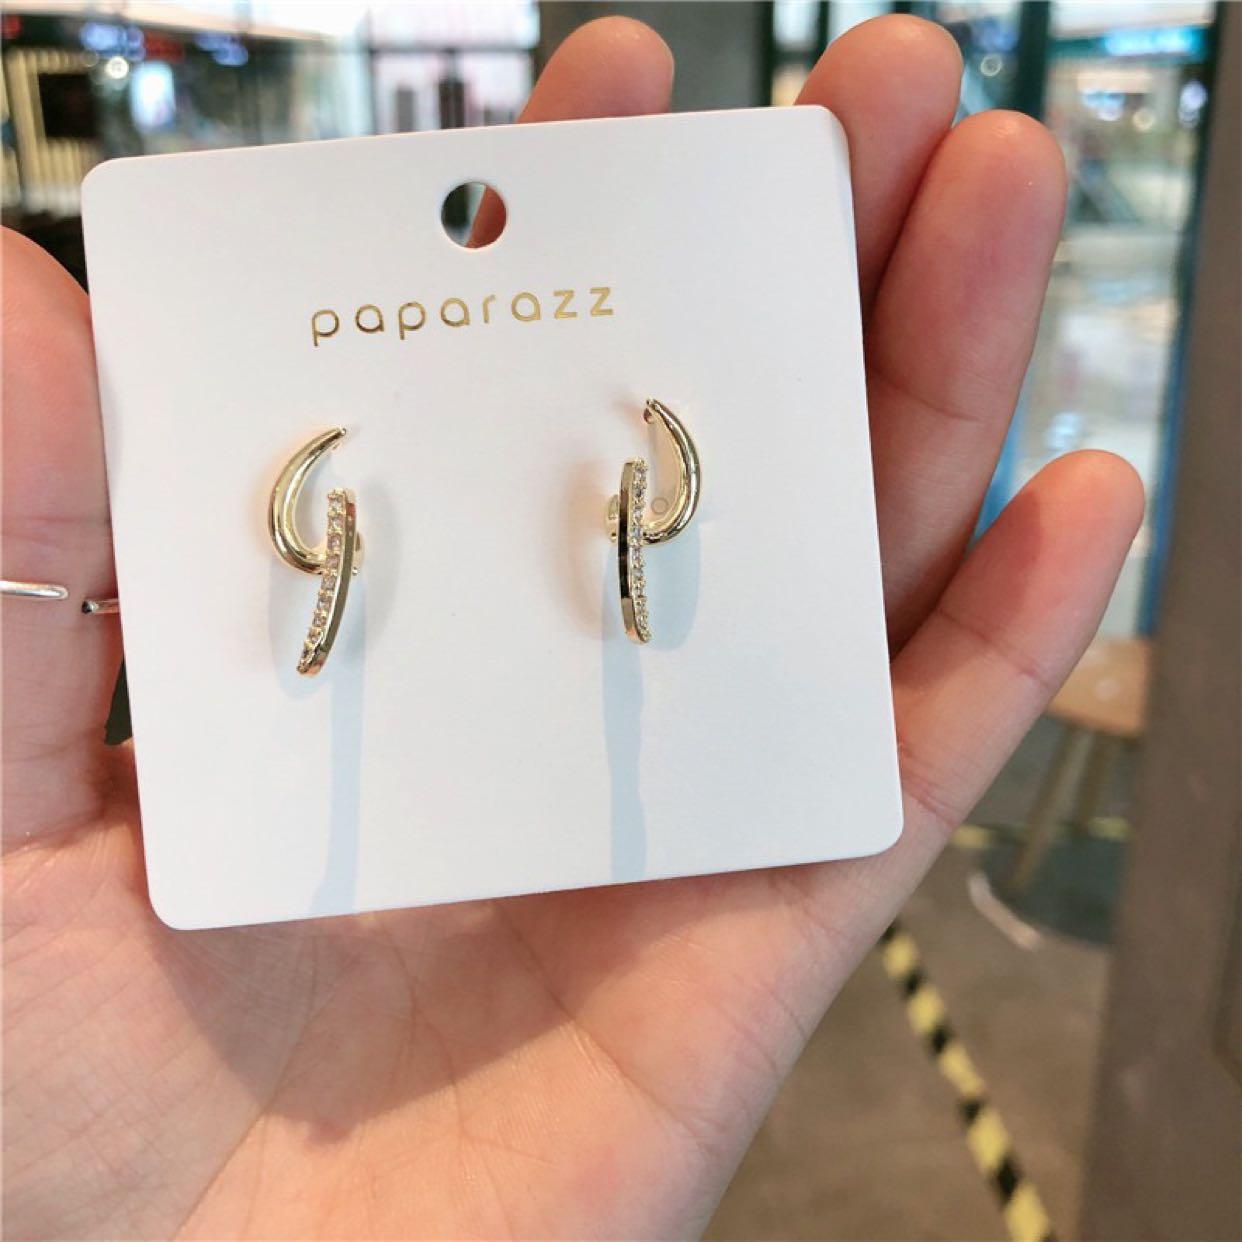 S925银针韩国东大门款极简几何扬帆耳钉微镶线条百搭小耳环耳饰